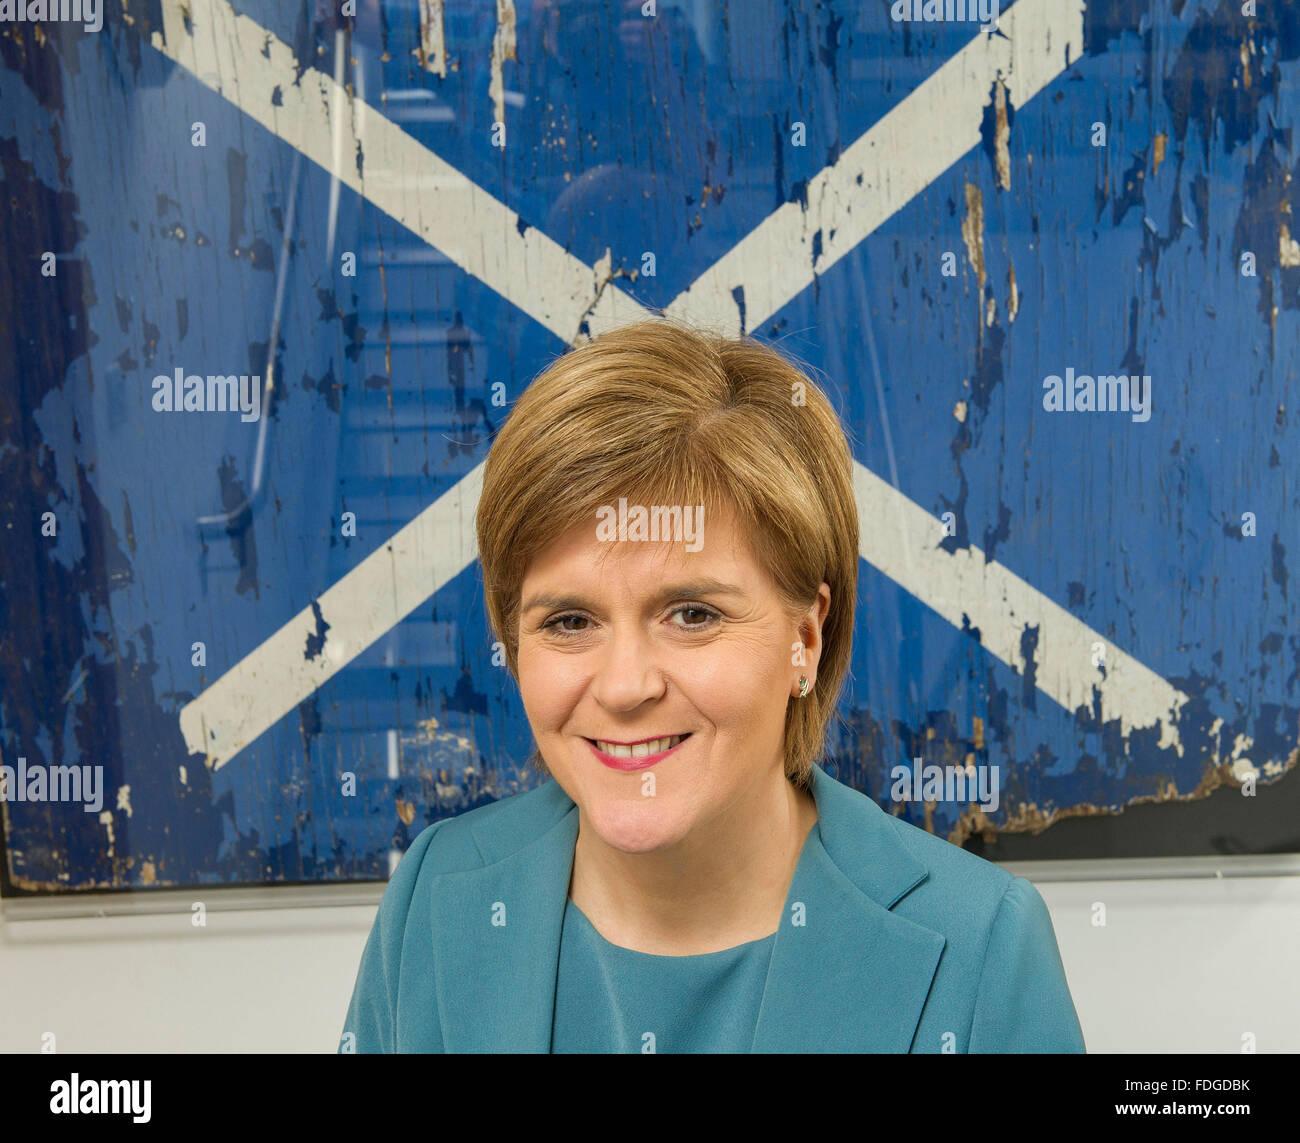 IR20150429. 29/04/15. Nicola Sturgeon, First Minister, Politics, Scotland, SNP. UK General Election 2015, Scotland's - Stock Image